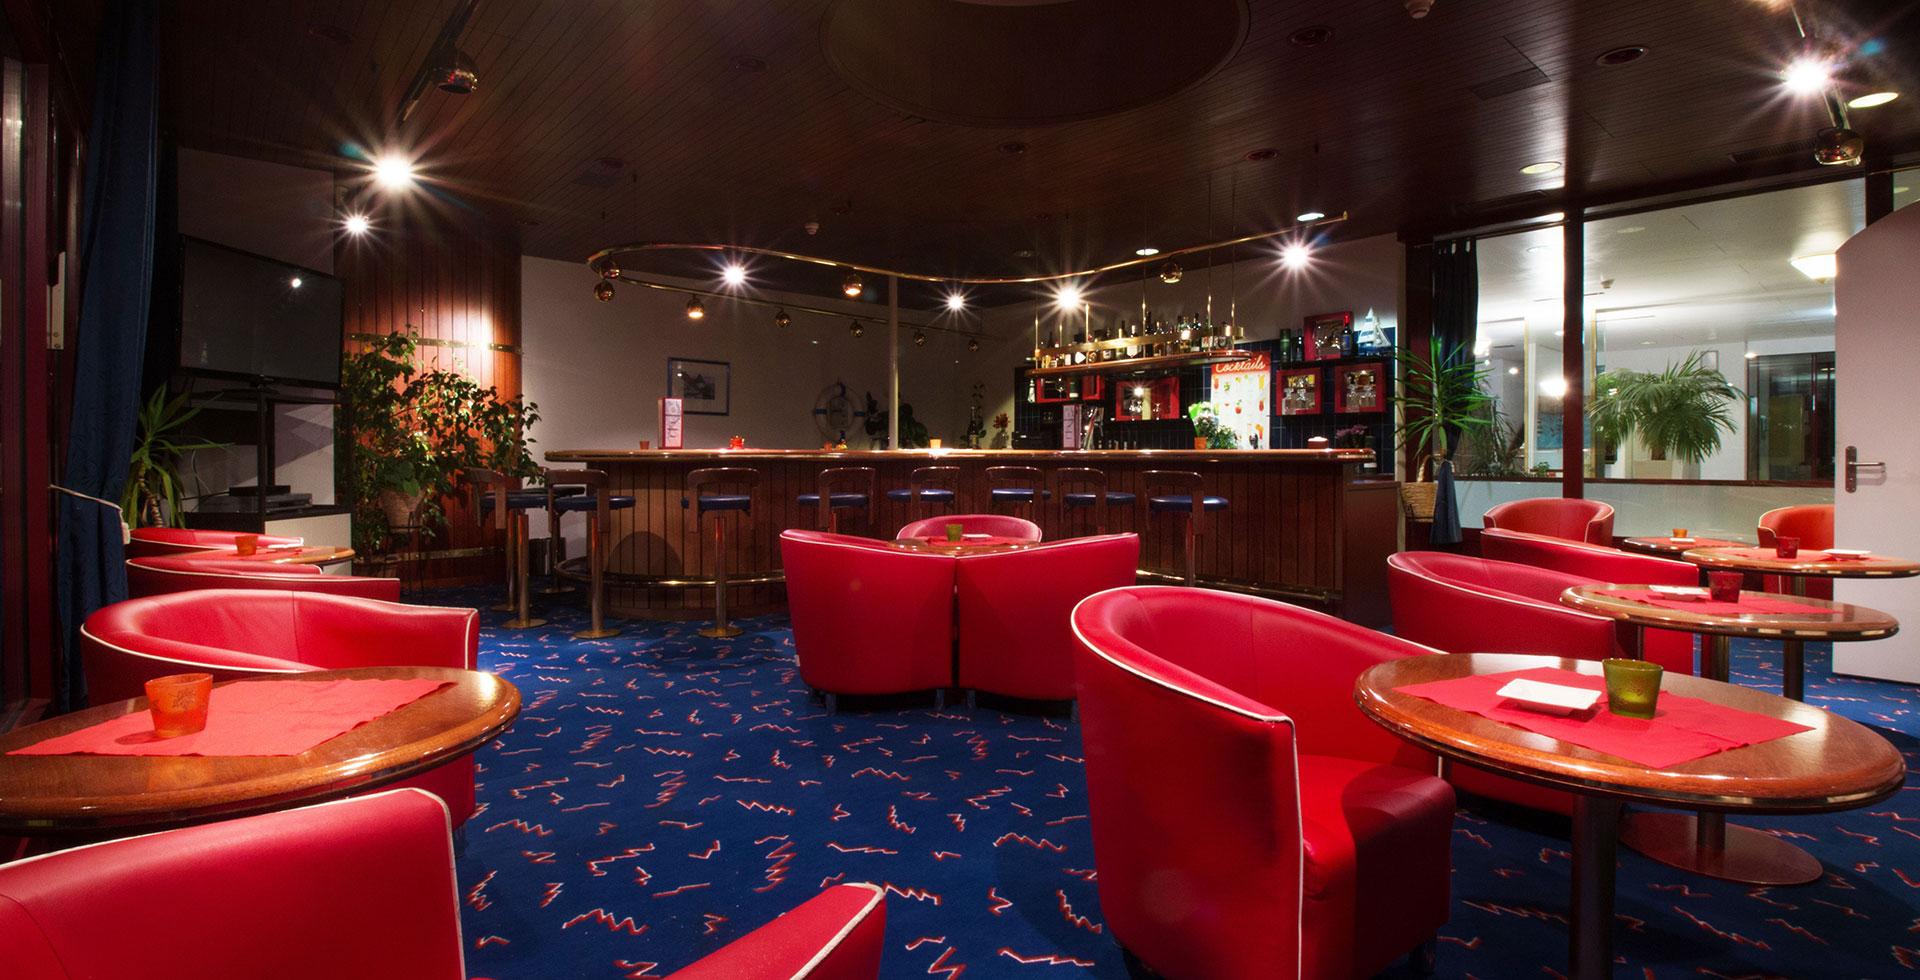 Slide Hotelbar-Feiern-Park-Hotel Inseli-cr-3857-1920x980